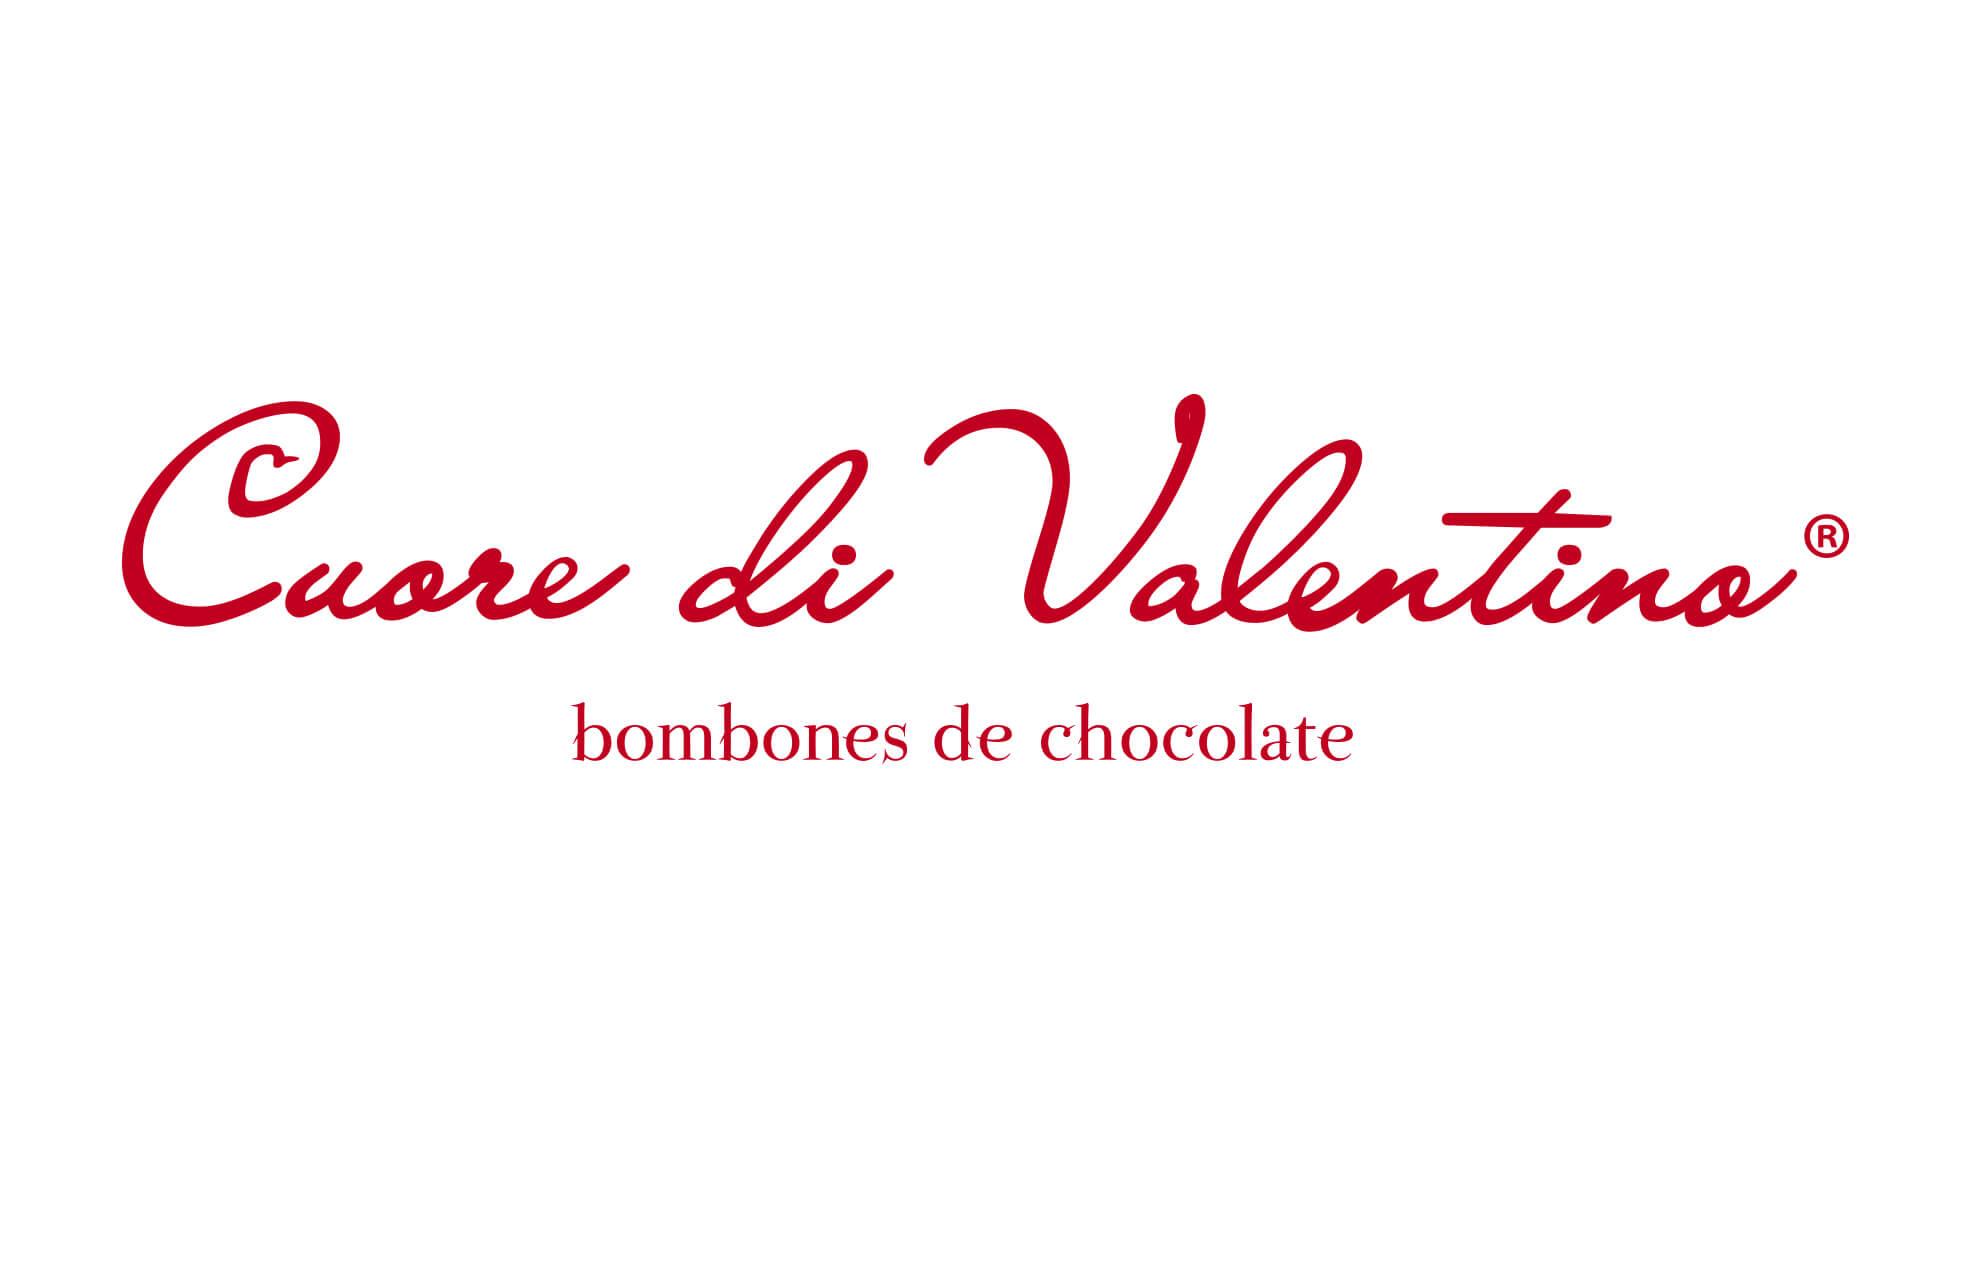 bombones chocolate logotipo1 - Branding. Alimentación.